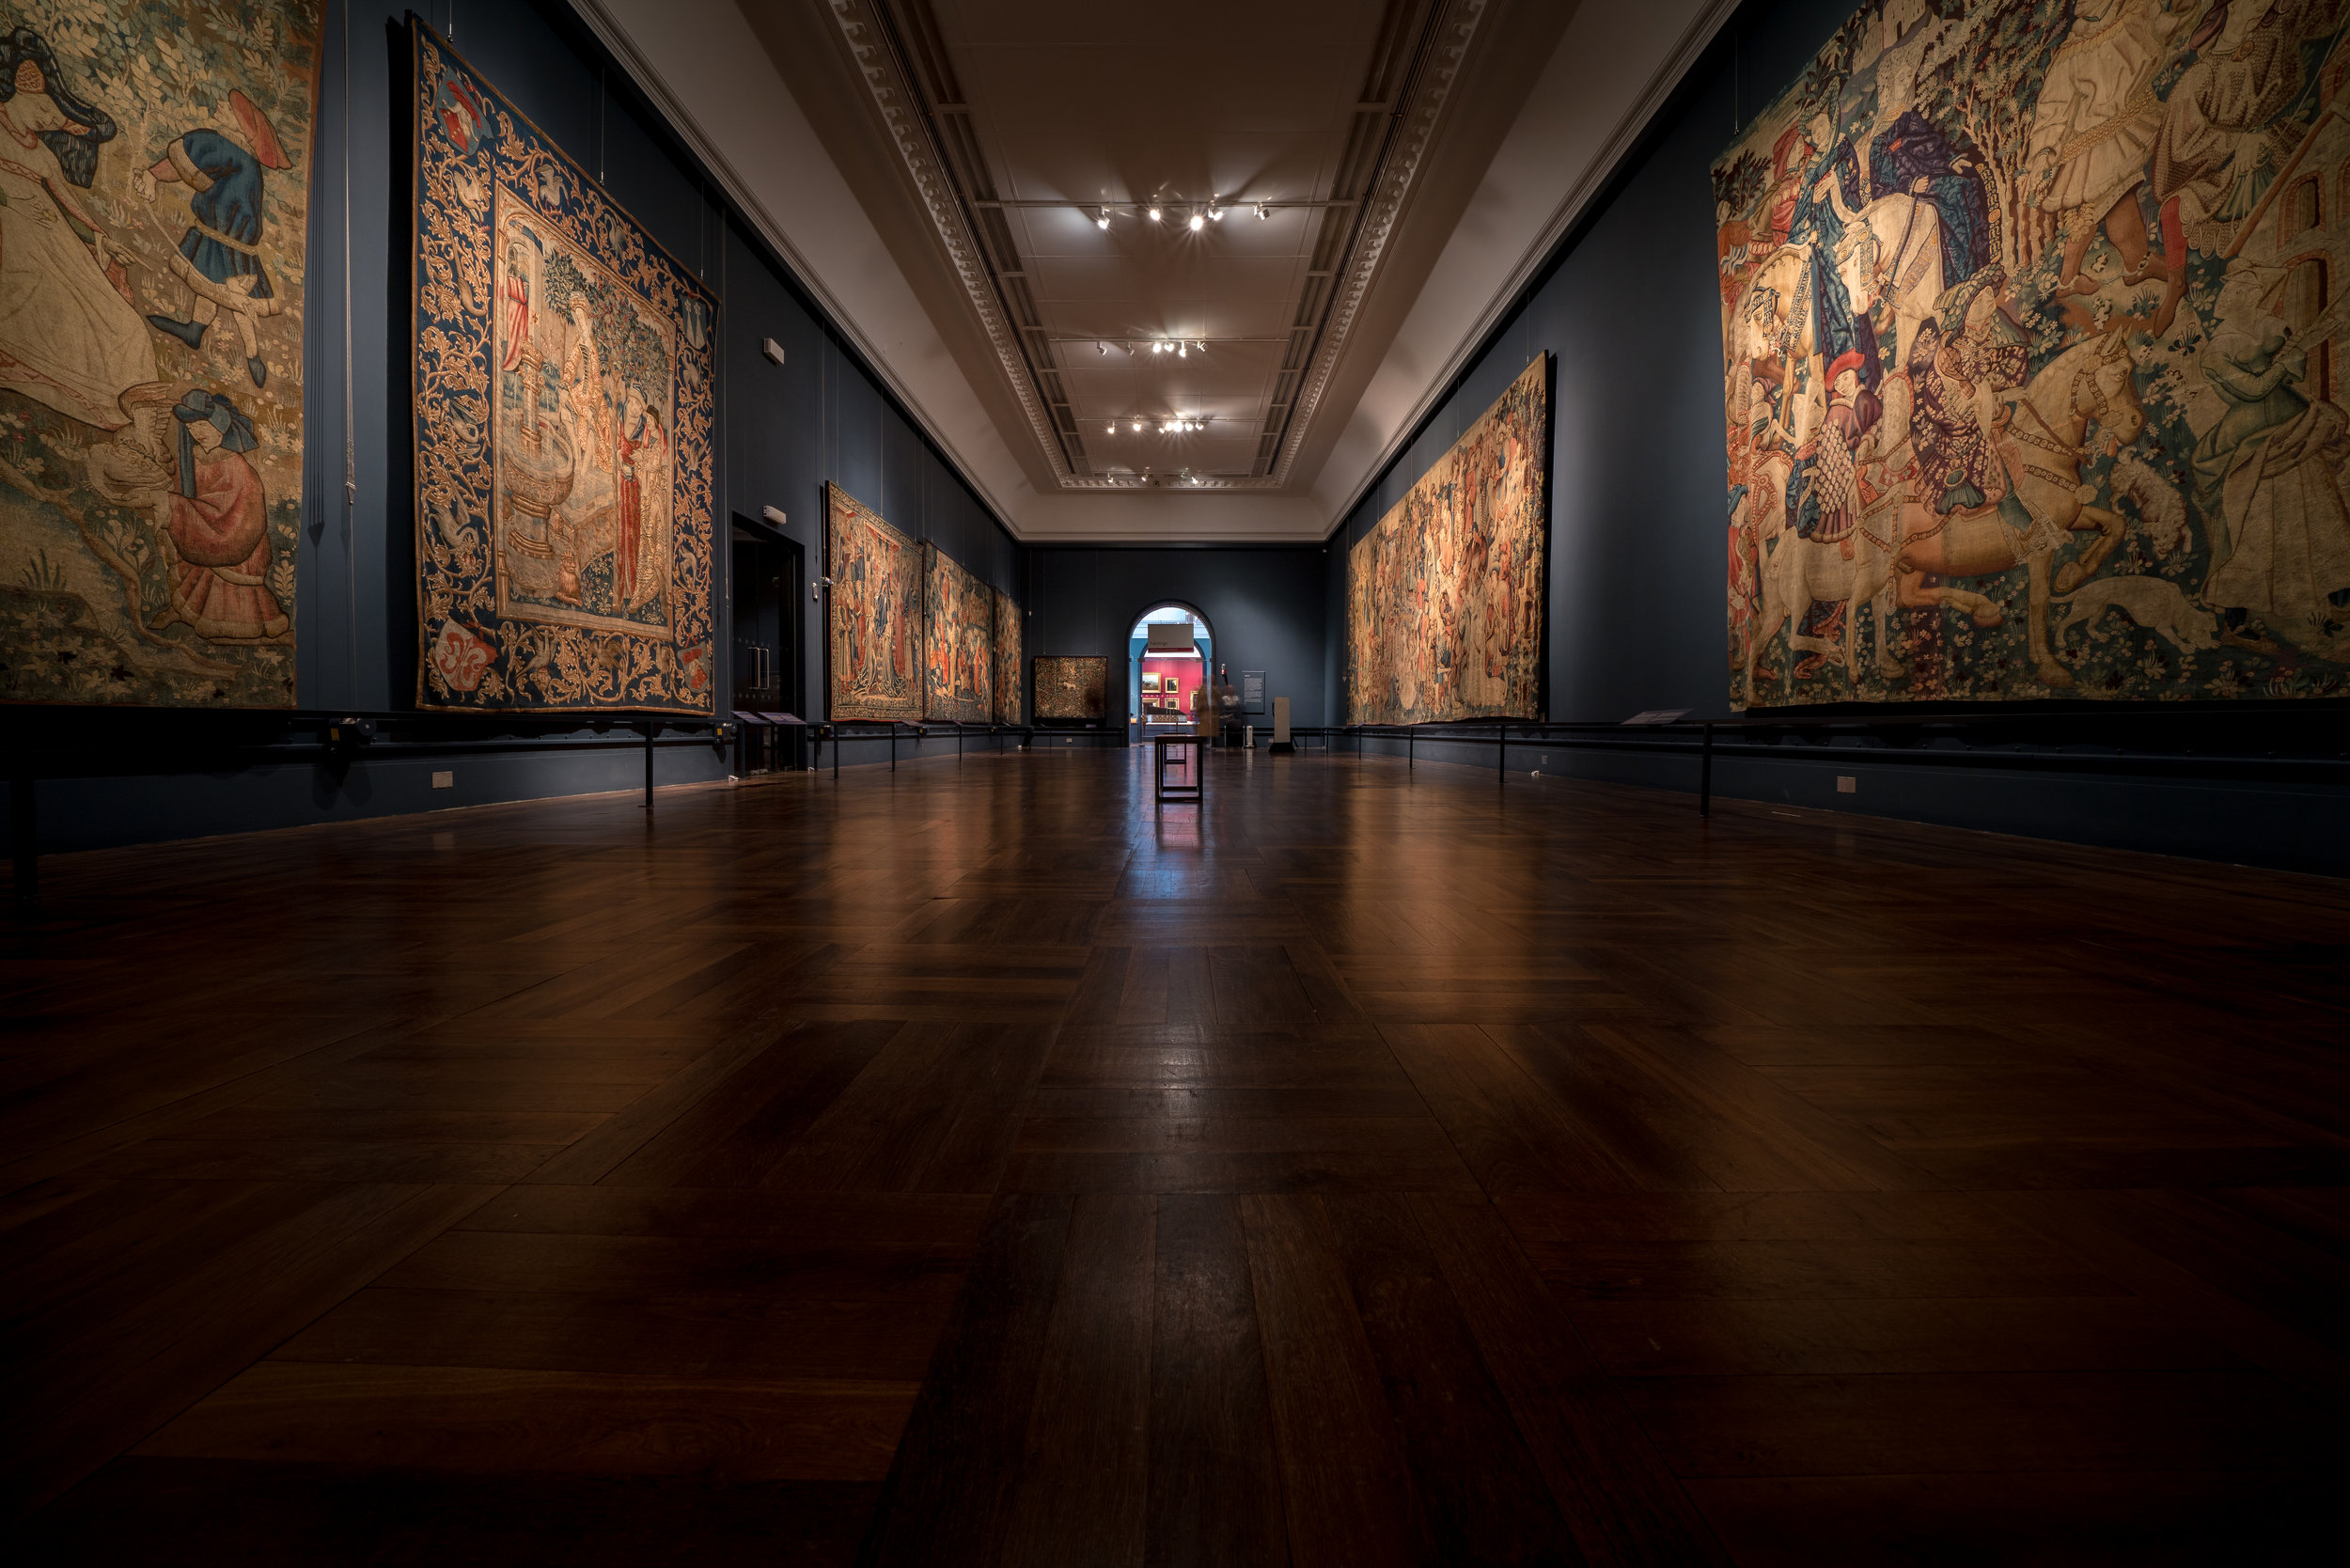 Tapestry room.  12-24 at 12mm, 13 secs iso 100